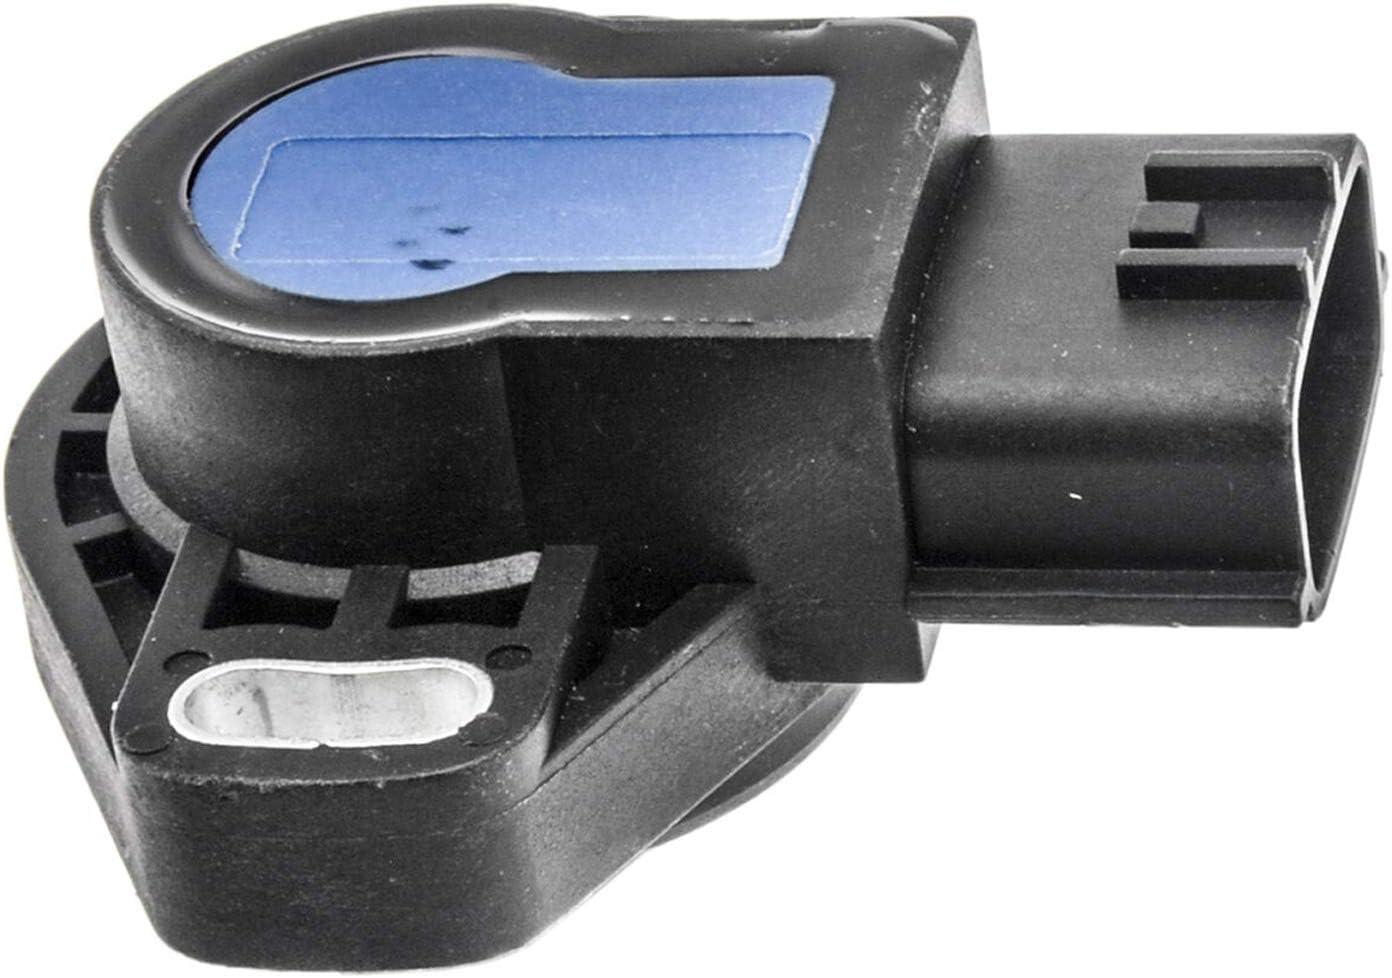 Herko Throttle Position Sensor TPS6035 For Suzuki Subaru Chevrolet 95-05